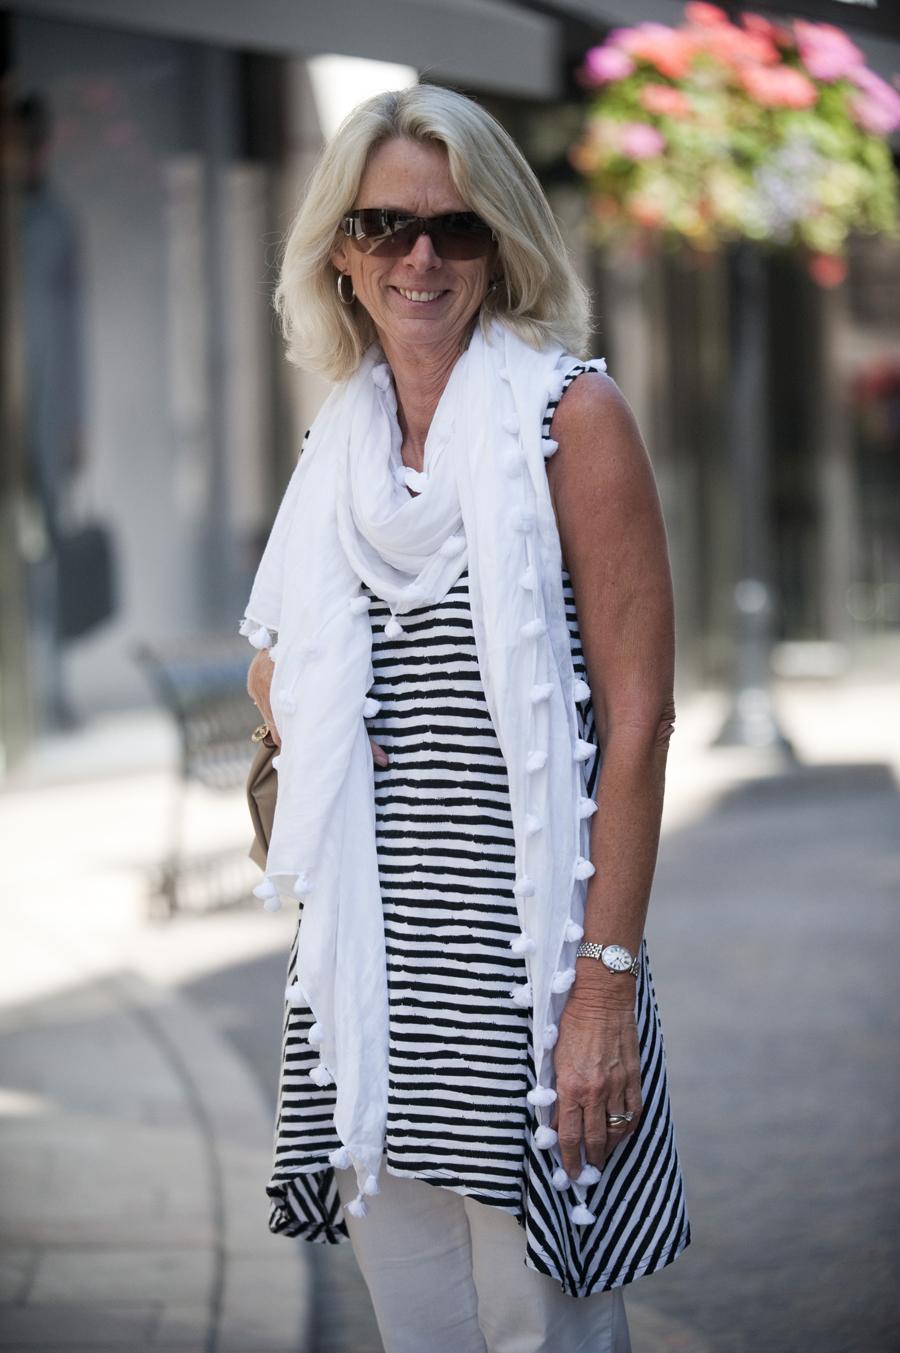 Vicki Treblem, 56, from Sydney wearing a white scarf with pom poms.